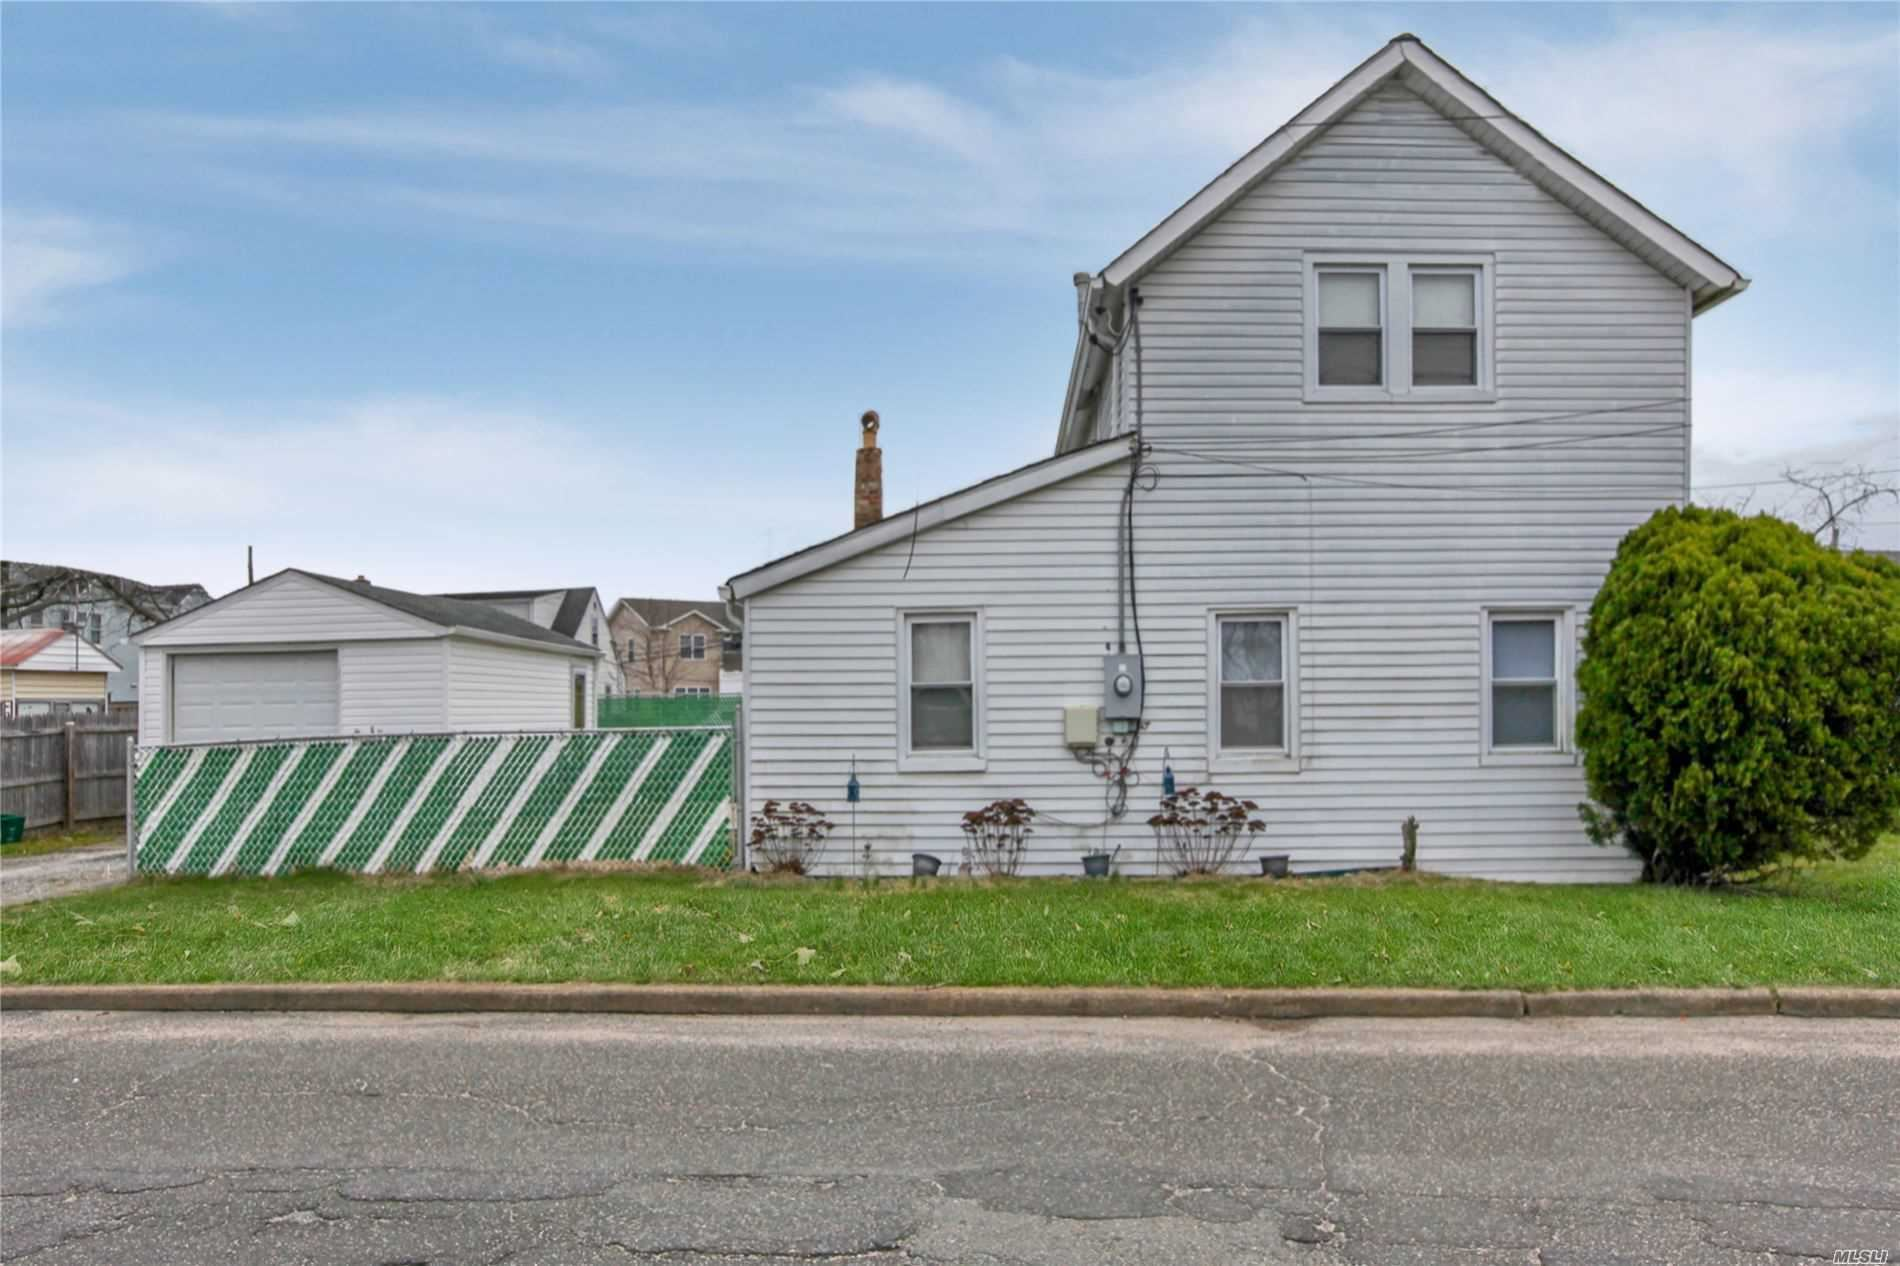 2471 S Seamans Neck Road, Seaford, NY 11783 - MLS#: 3207787